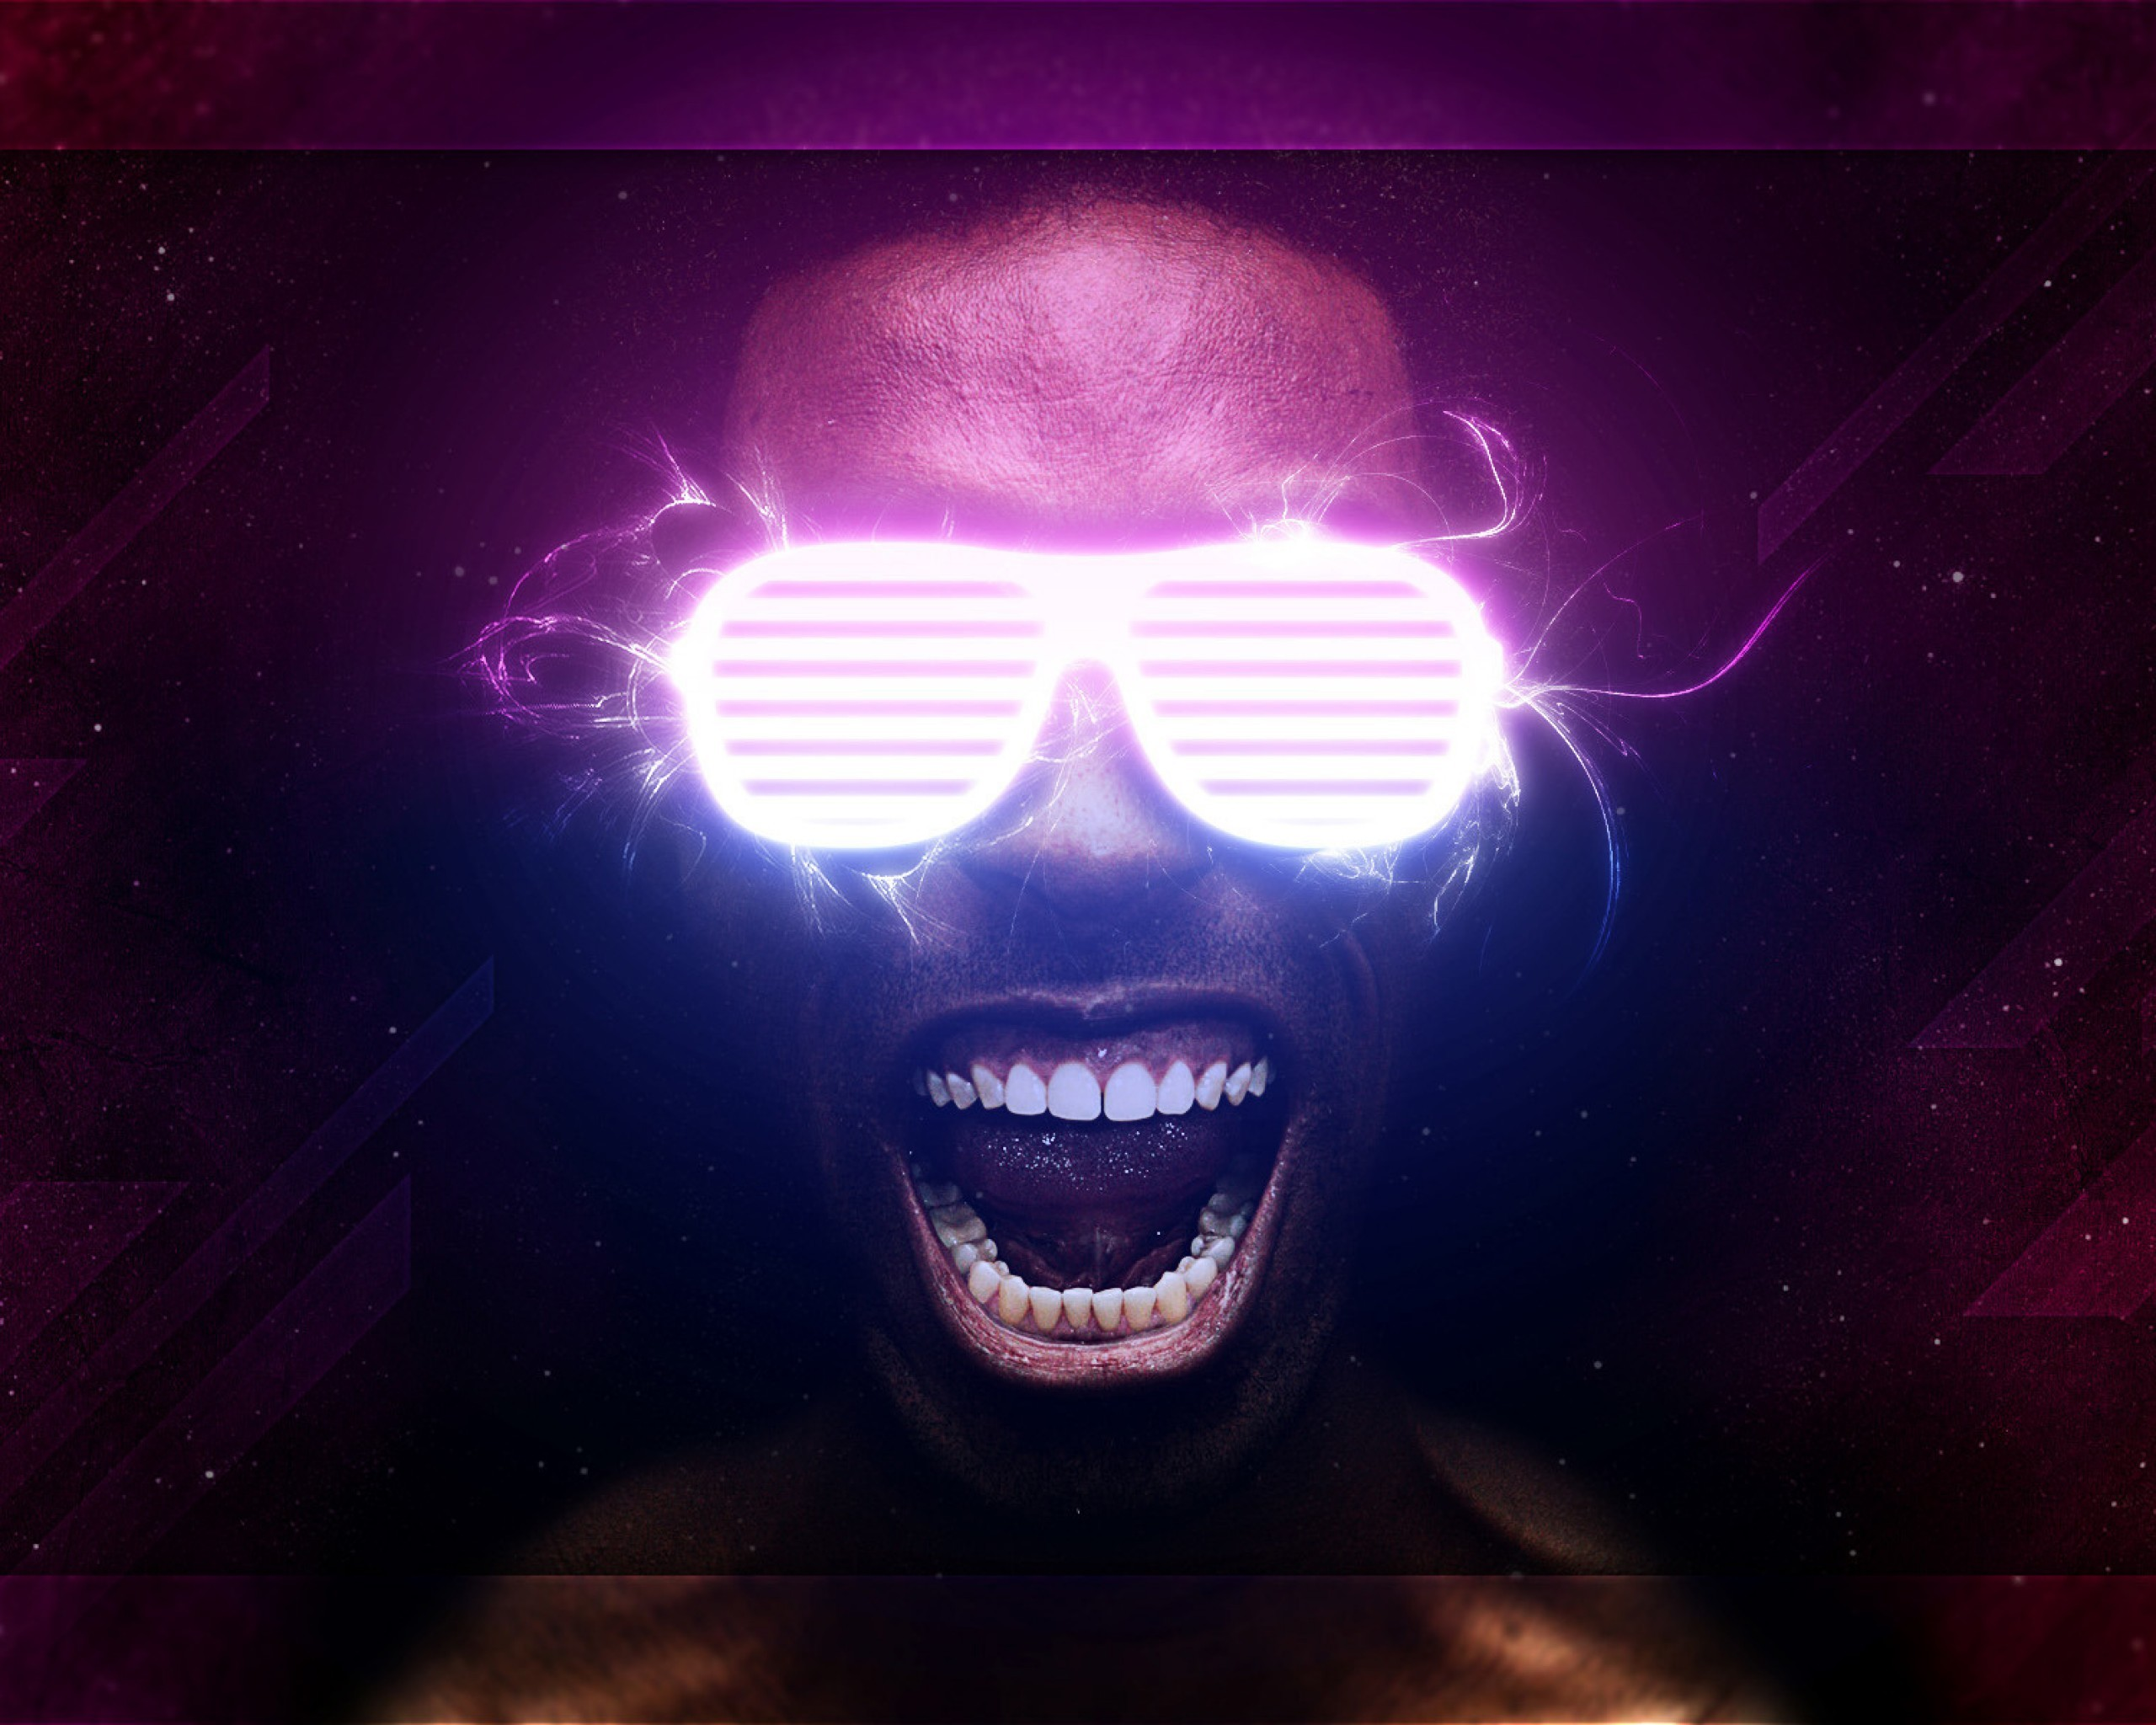 неон маска neon mask  № 2321247 бесплатно